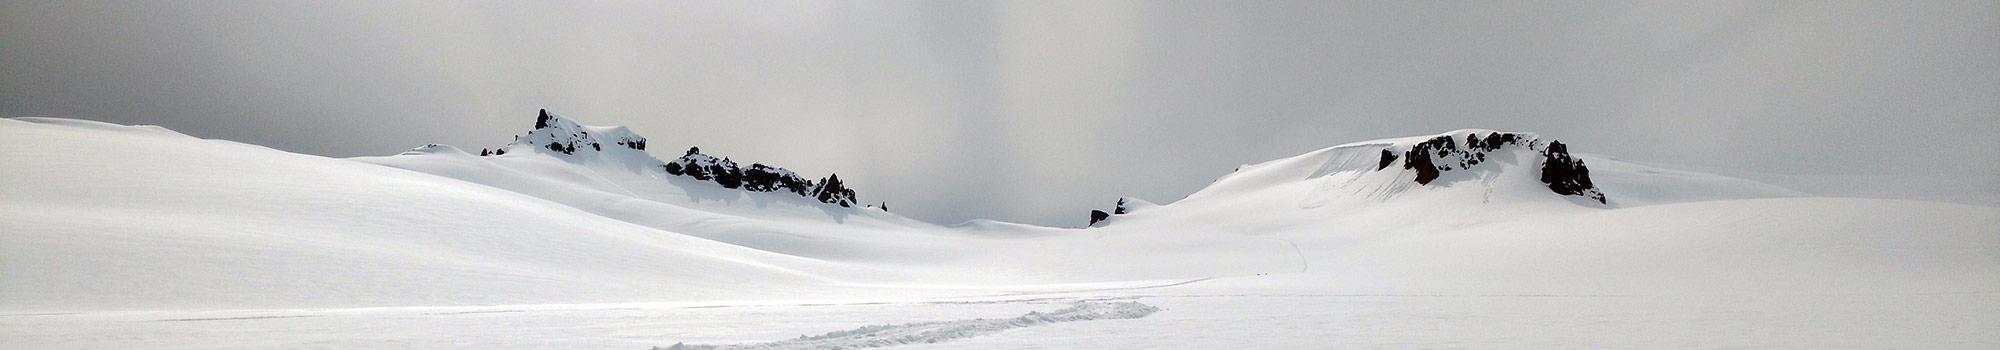 vatnajokull-glacier